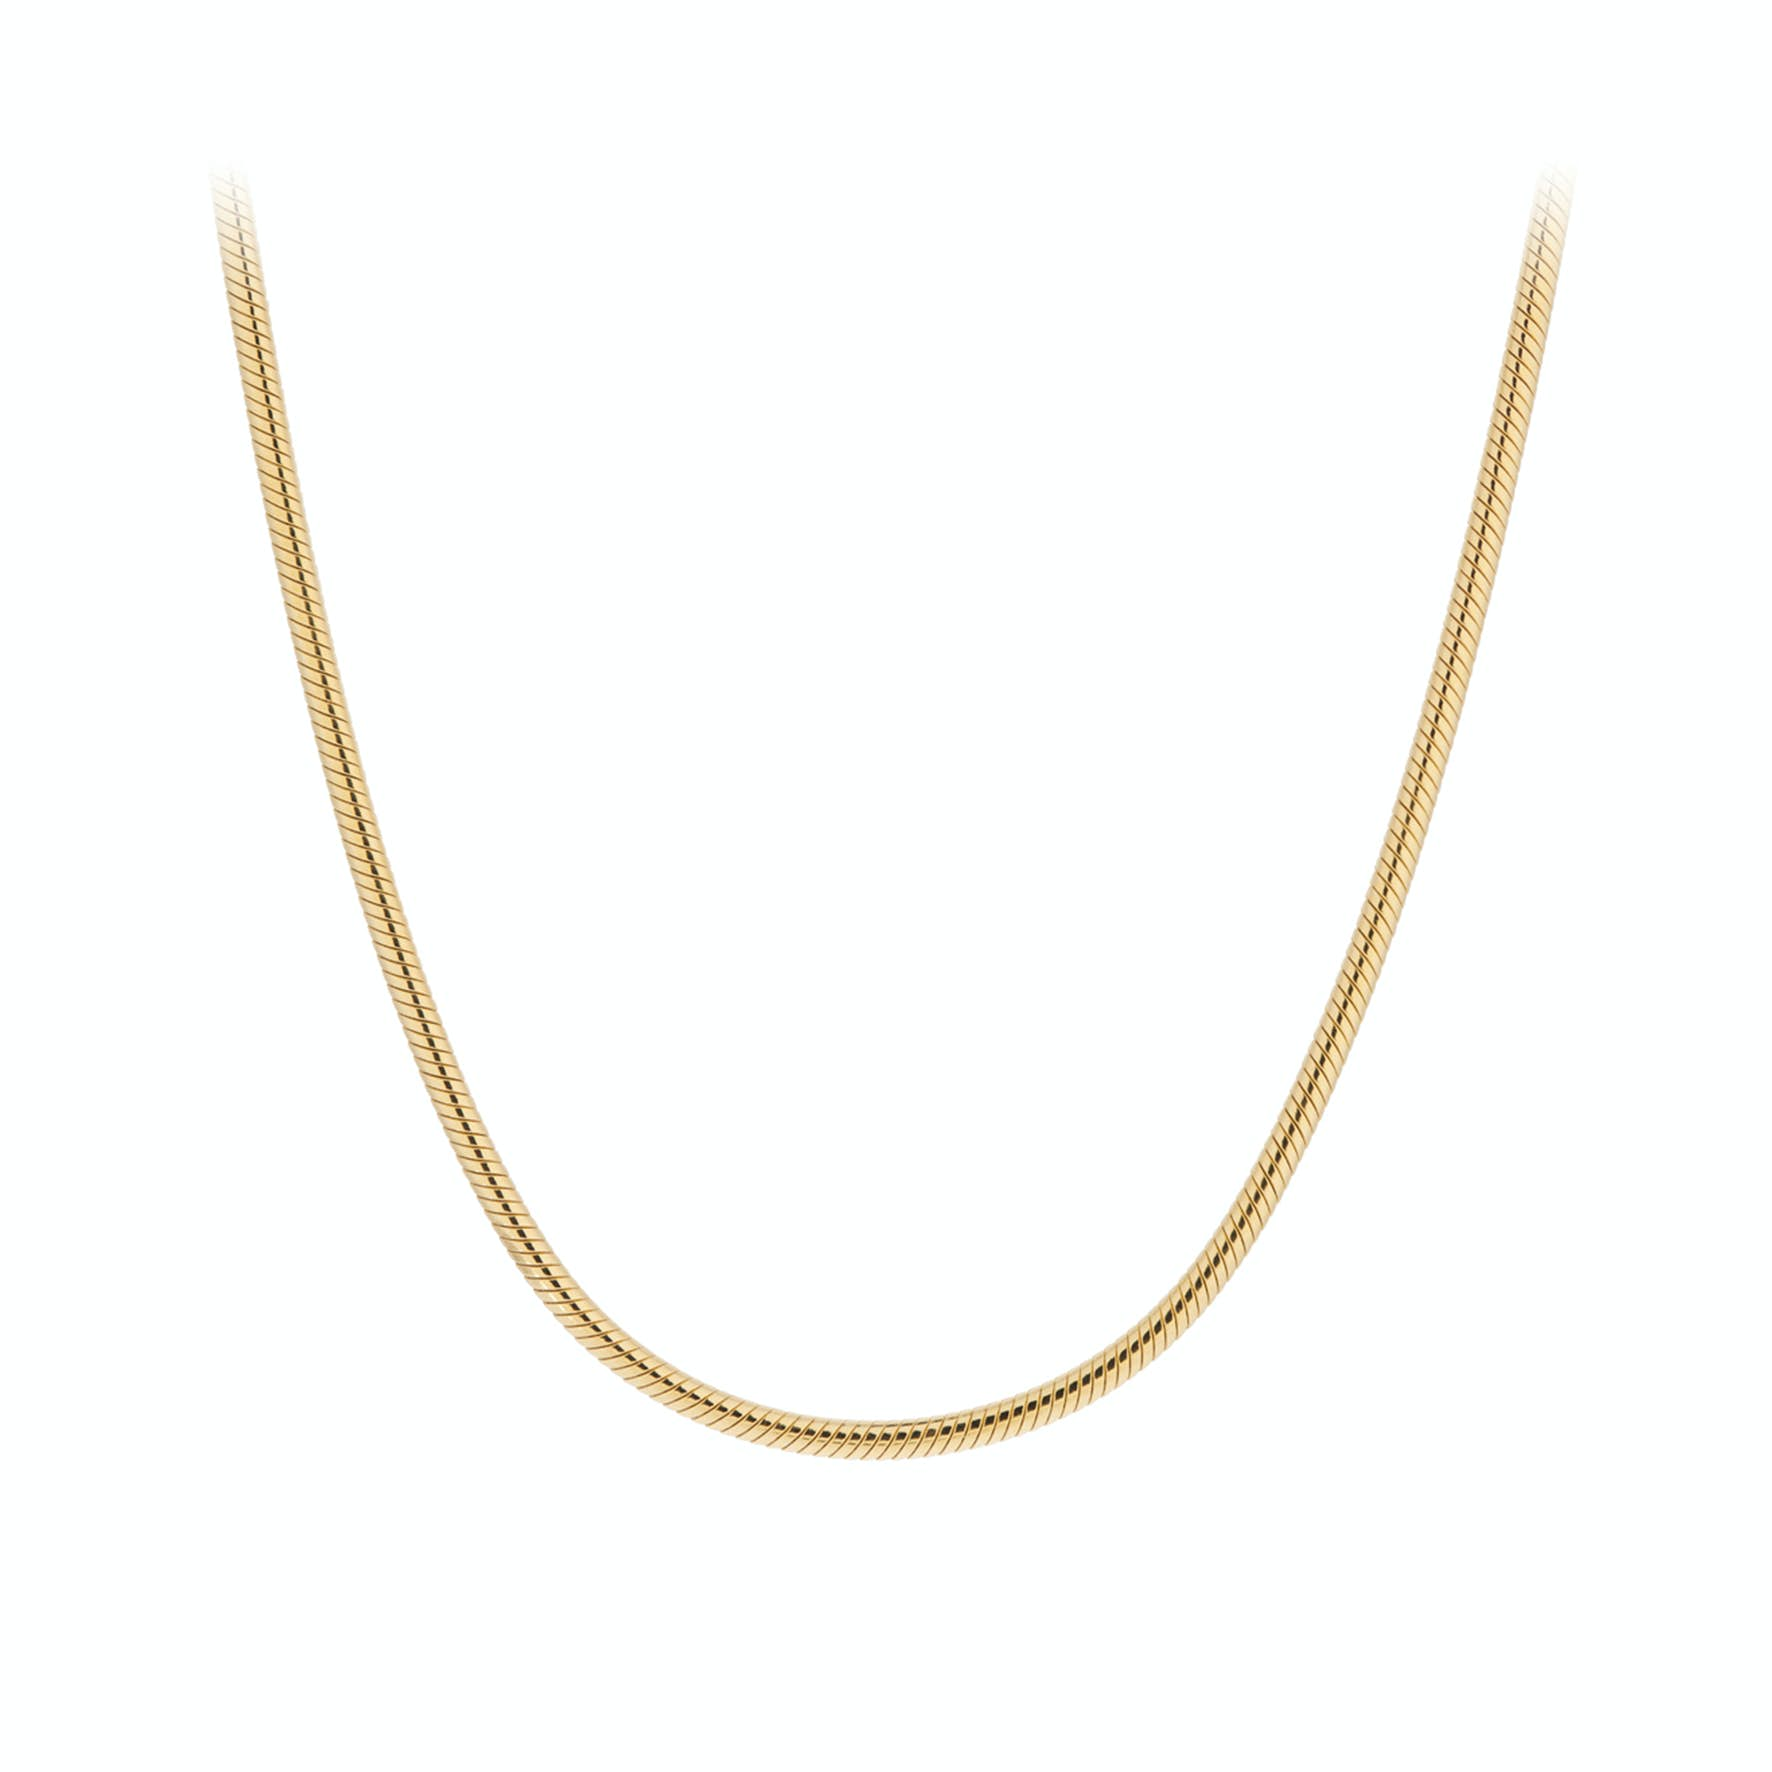 Snake Necklace von Pernille Corydon in Vergoldet-Silber Sterling 925